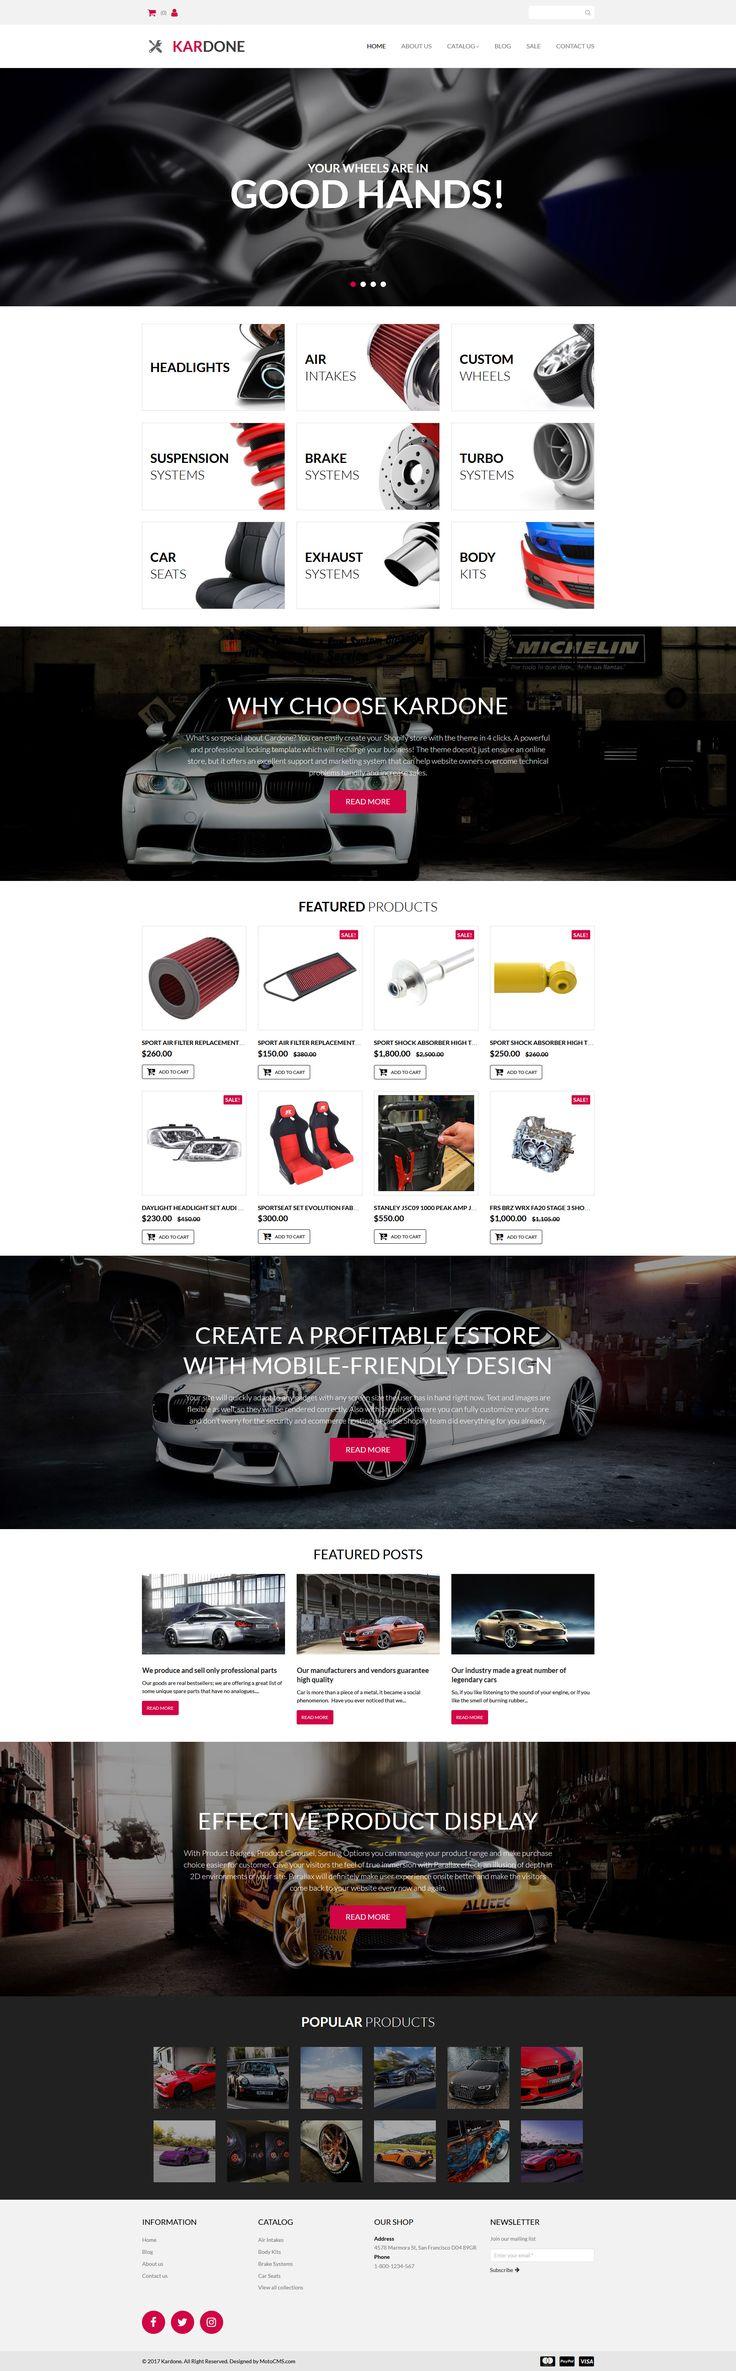 17 best images about new website templates on pinterest. Black Bedroom Furniture Sets. Home Design Ideas